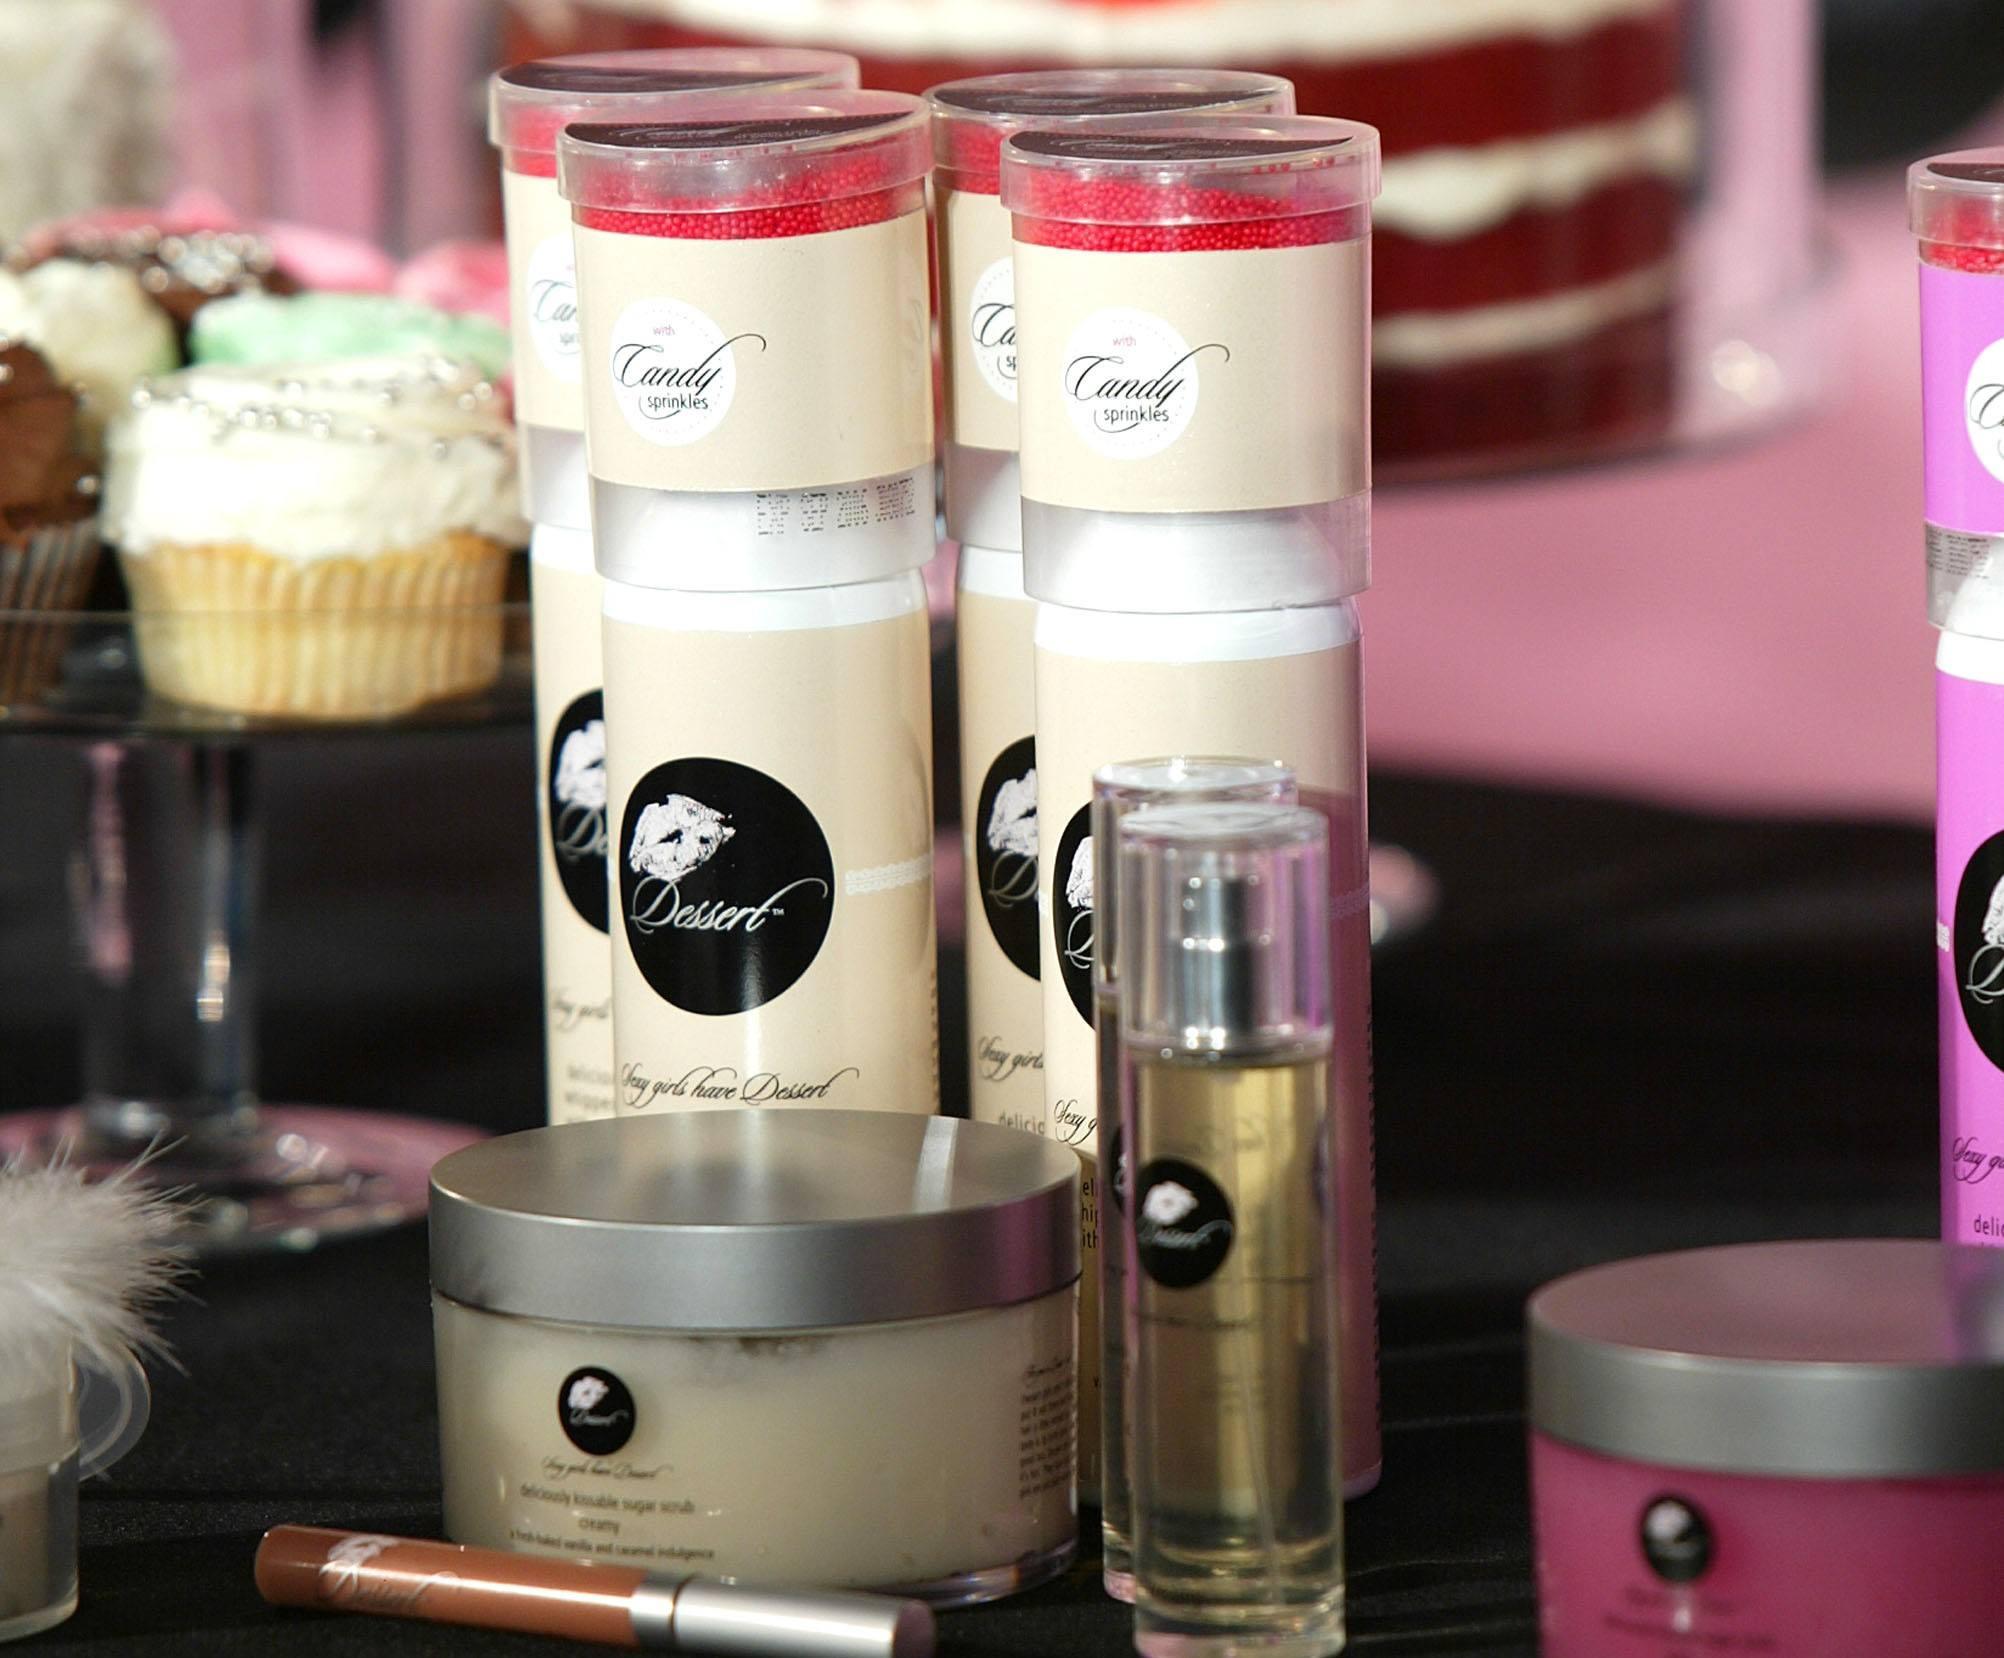 Jessica Simpson Launches New Fragrance & Body Care Line Dessert